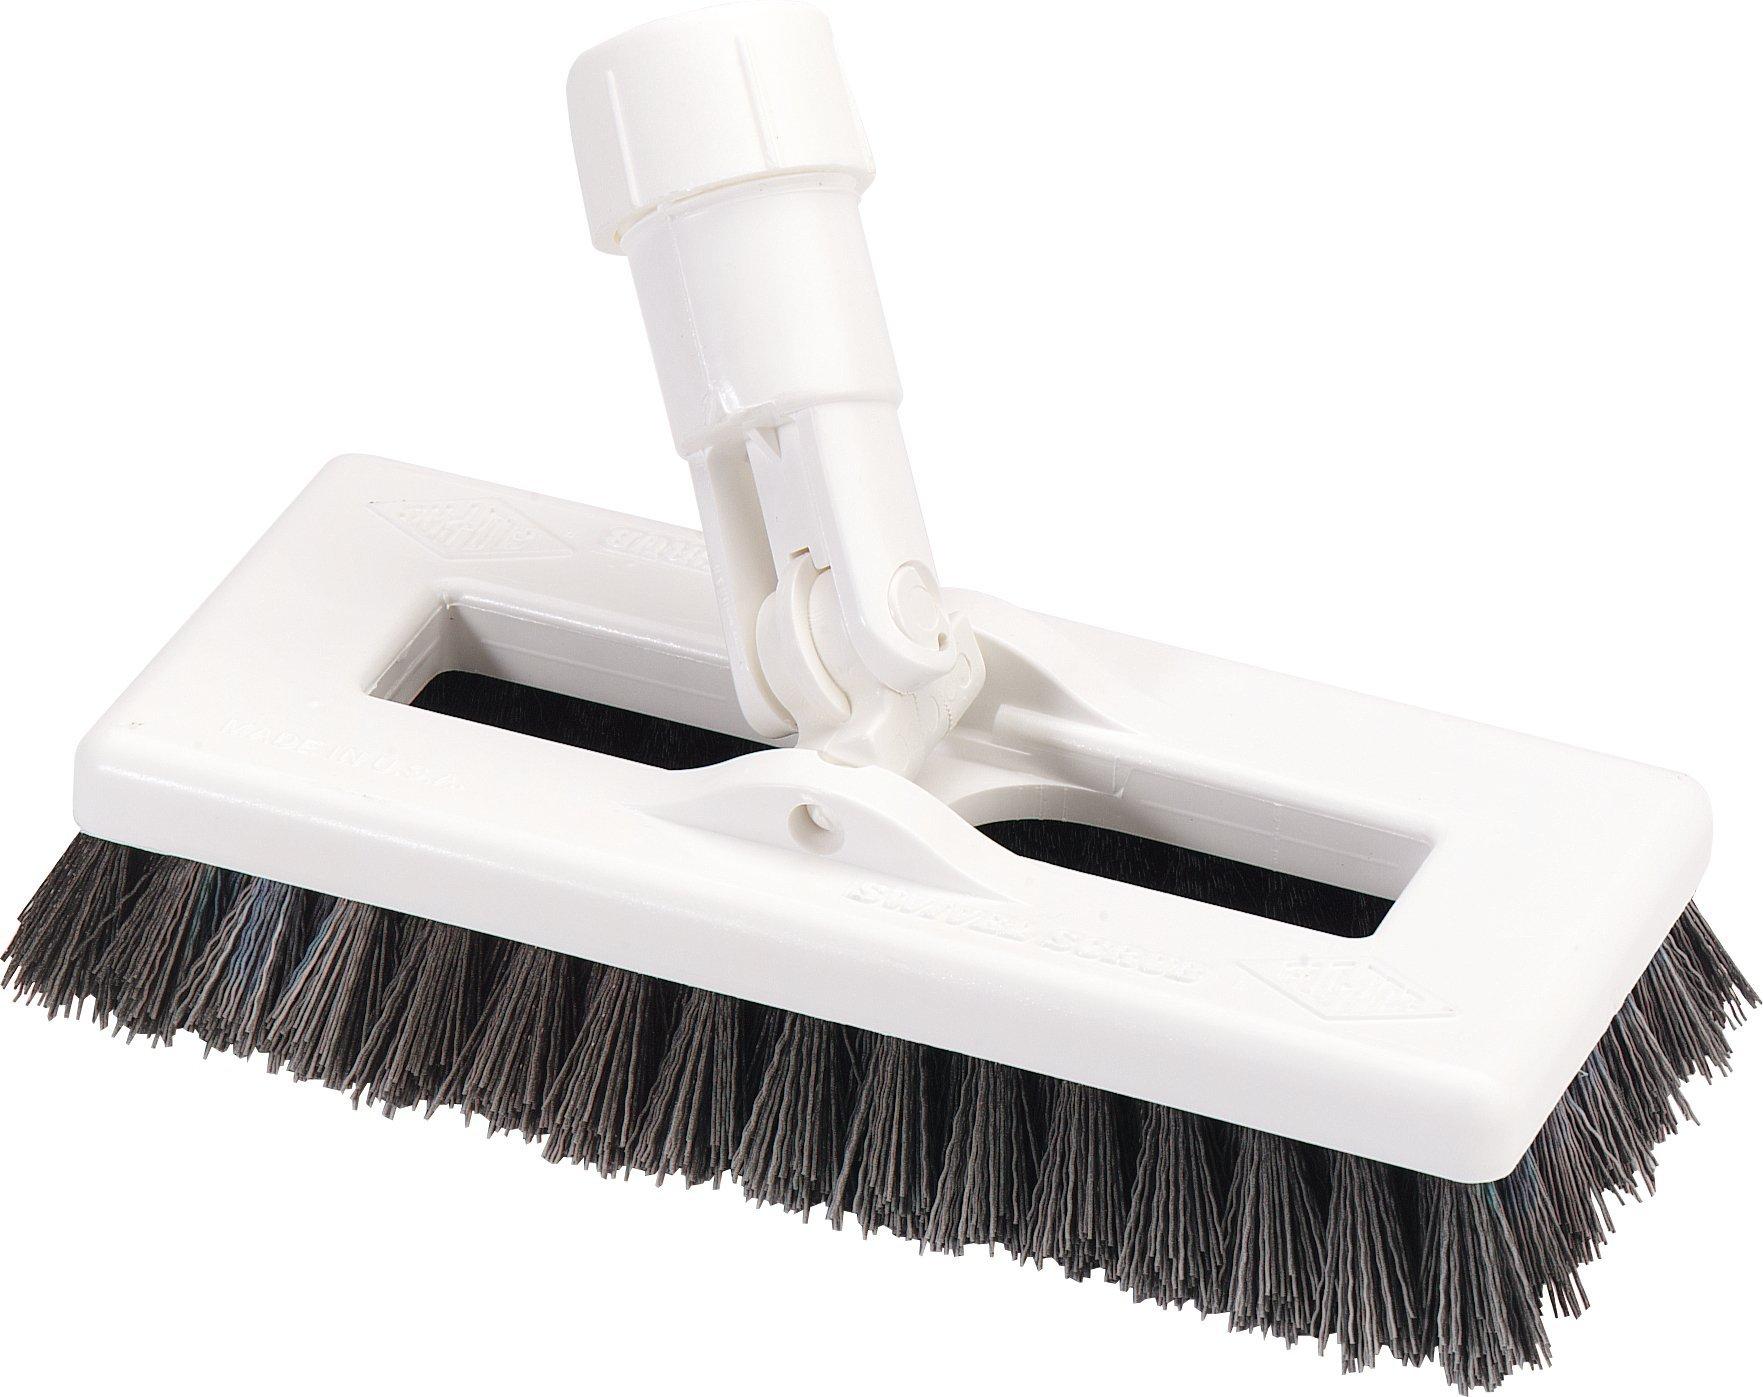 Carlisle 363883103 Swivel Scrub Brush, 8'', Black